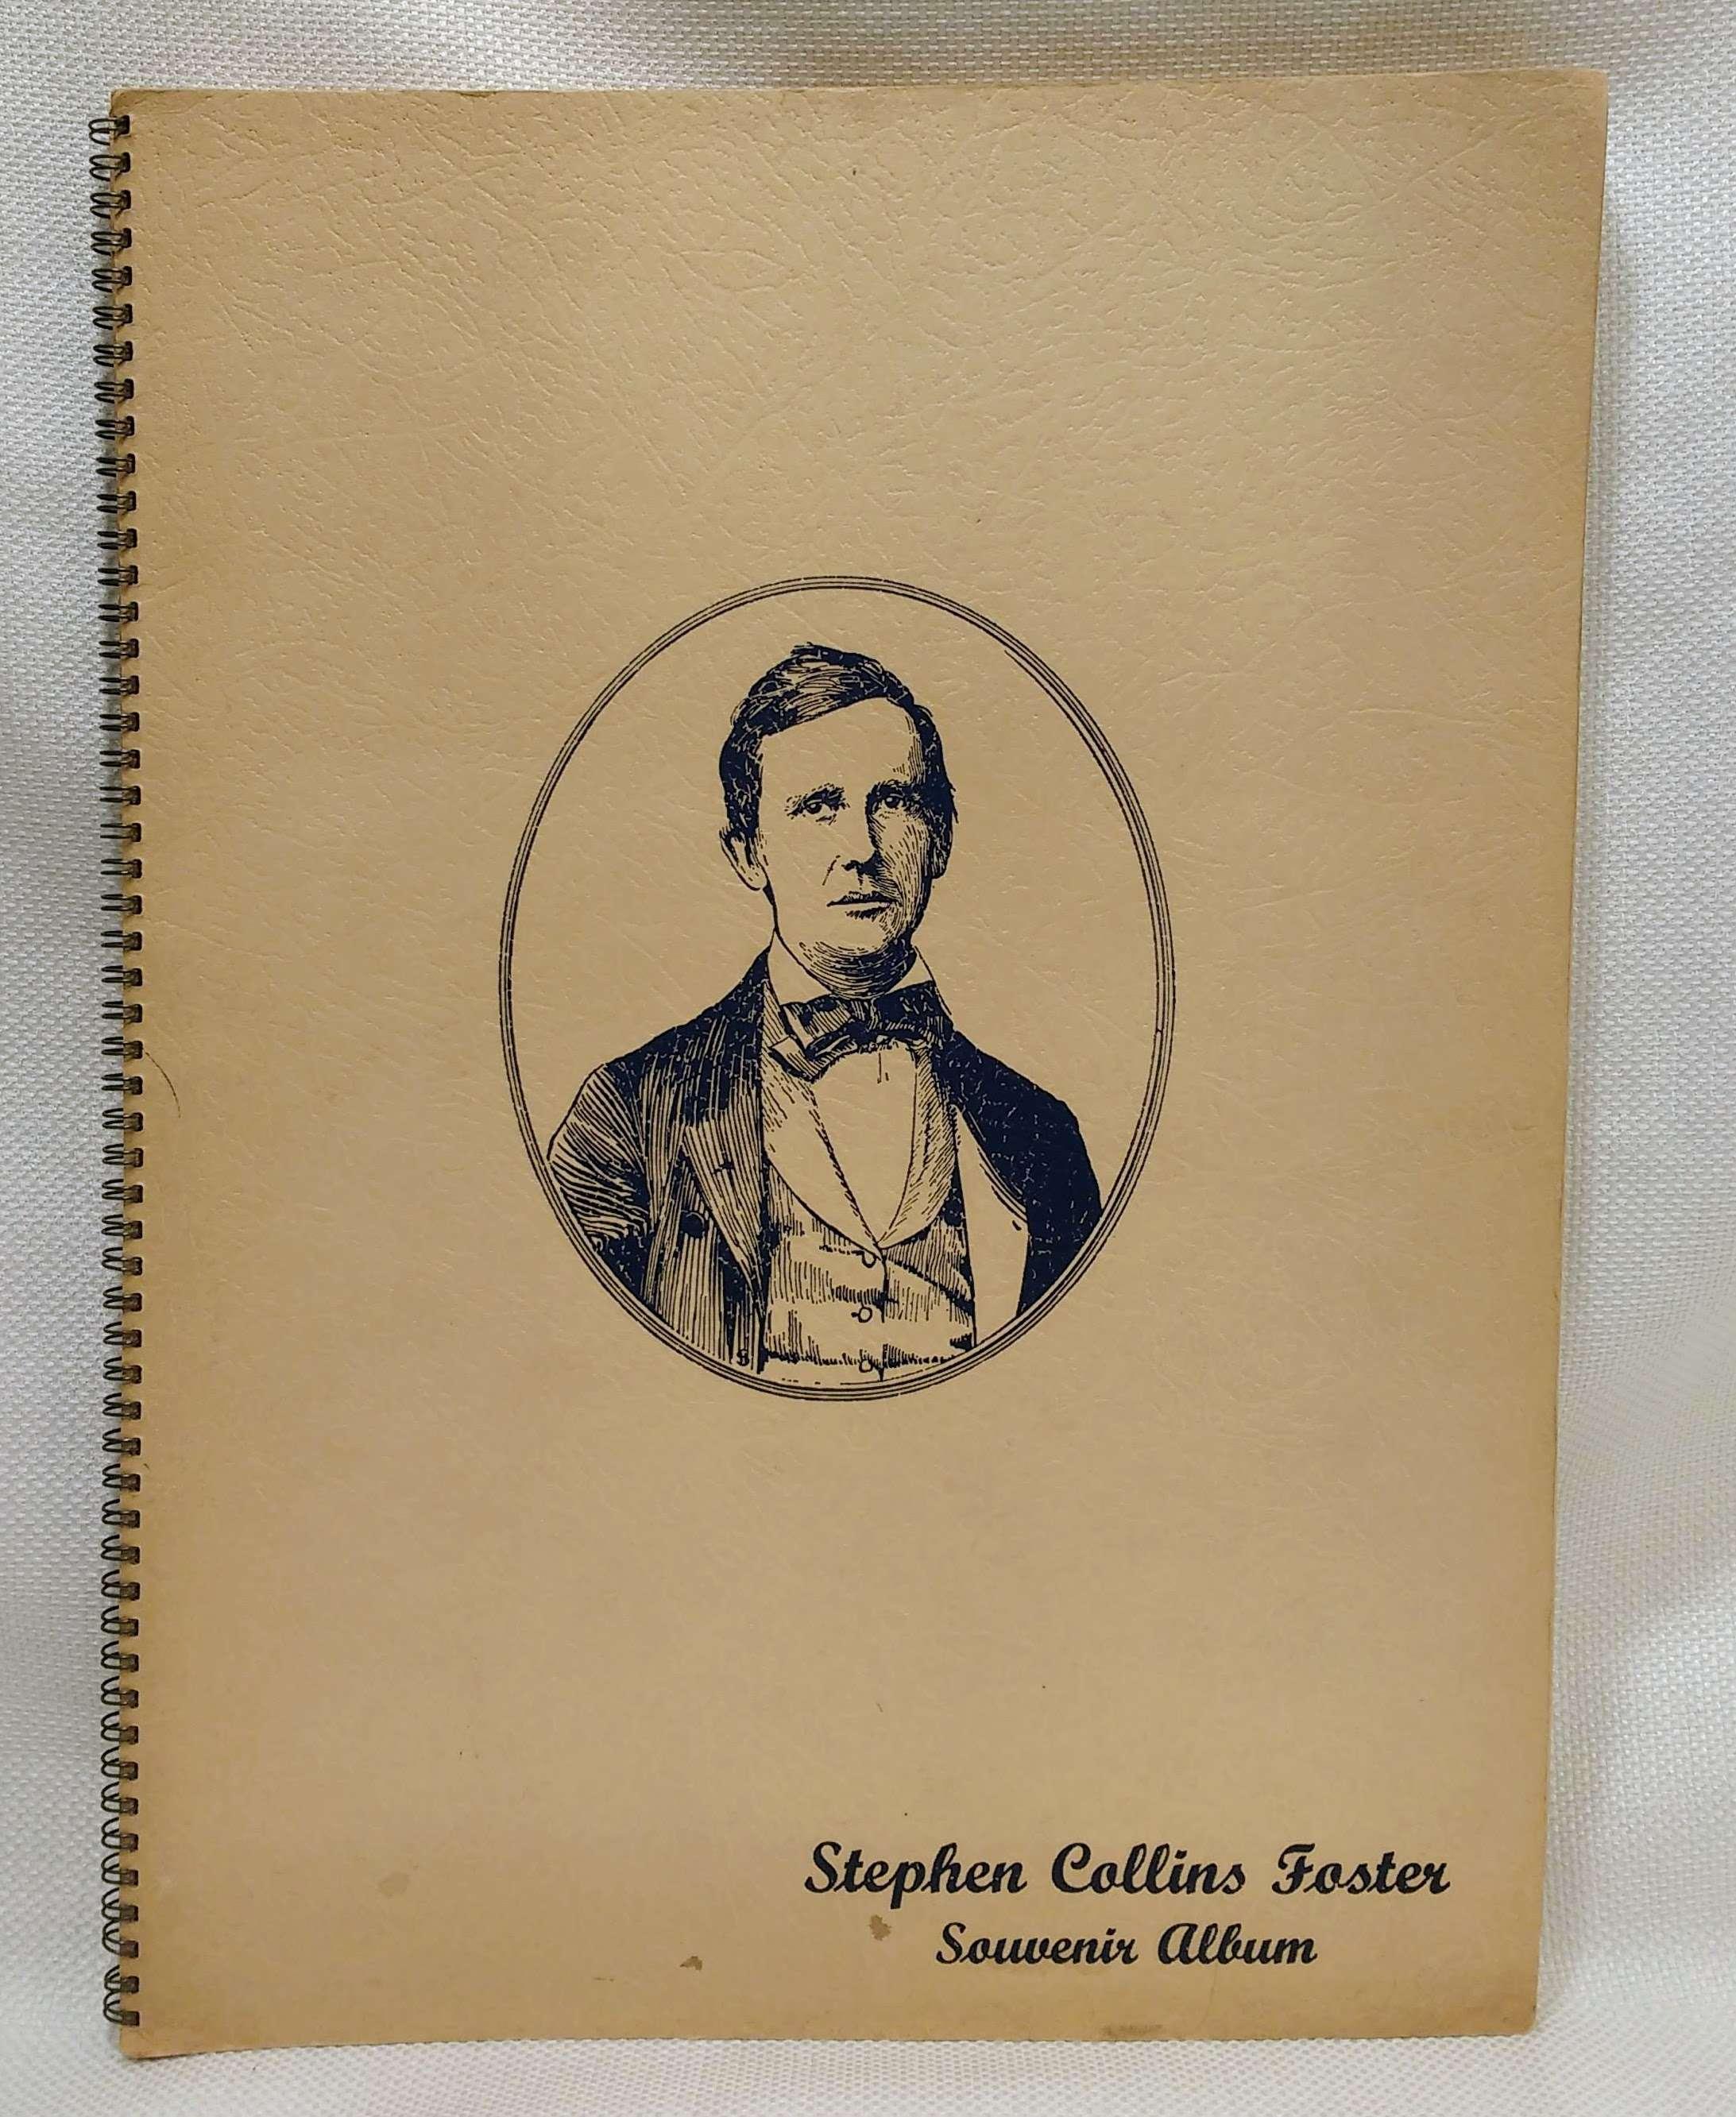 Stephen Collins Foster Souvenir Album, Foster, Stephen Collins, Illustrated by: